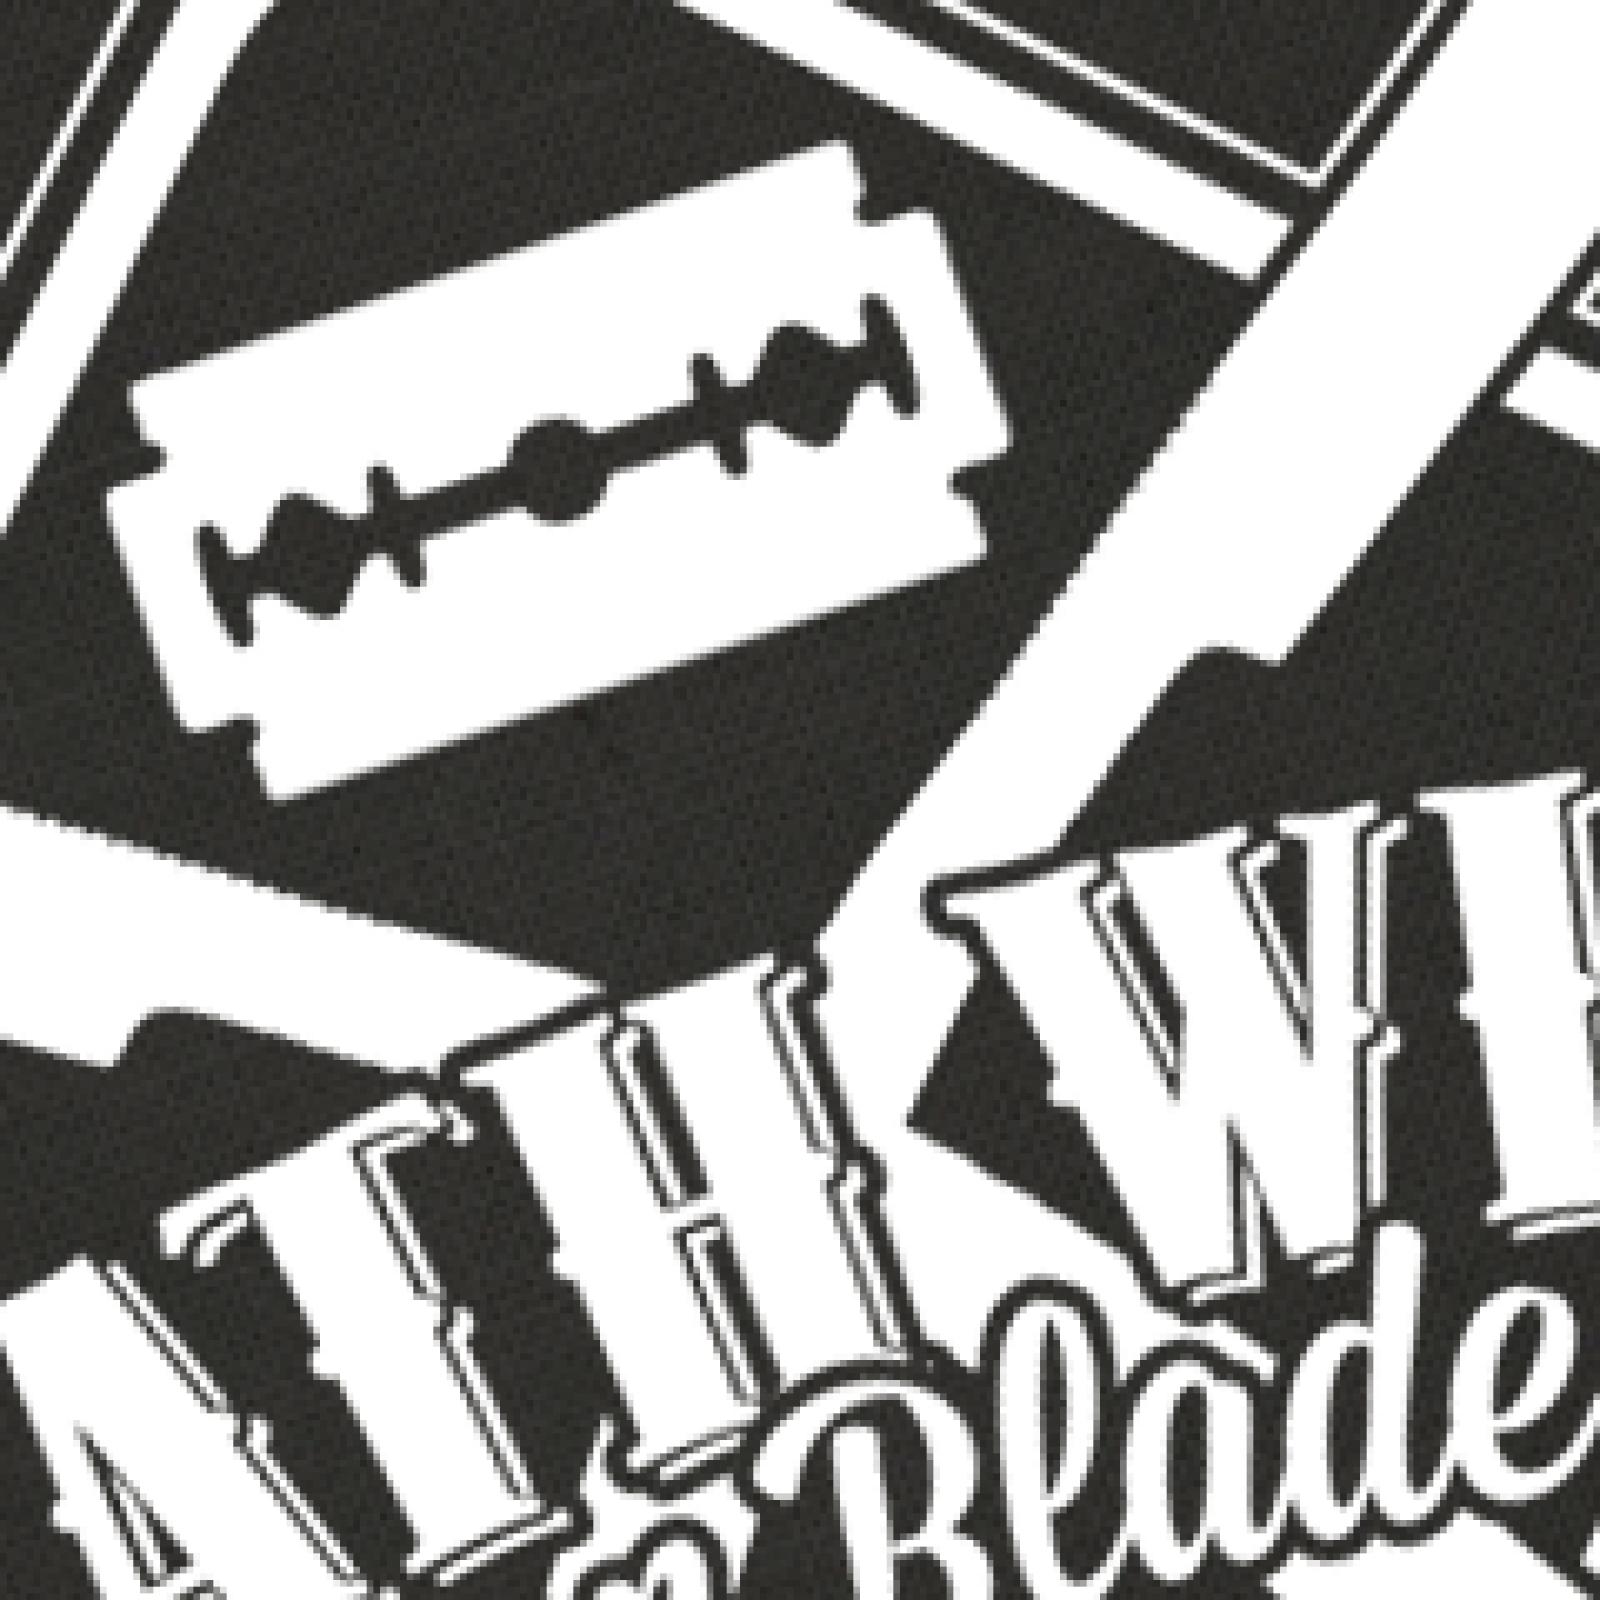 death wish razor blades shirt print